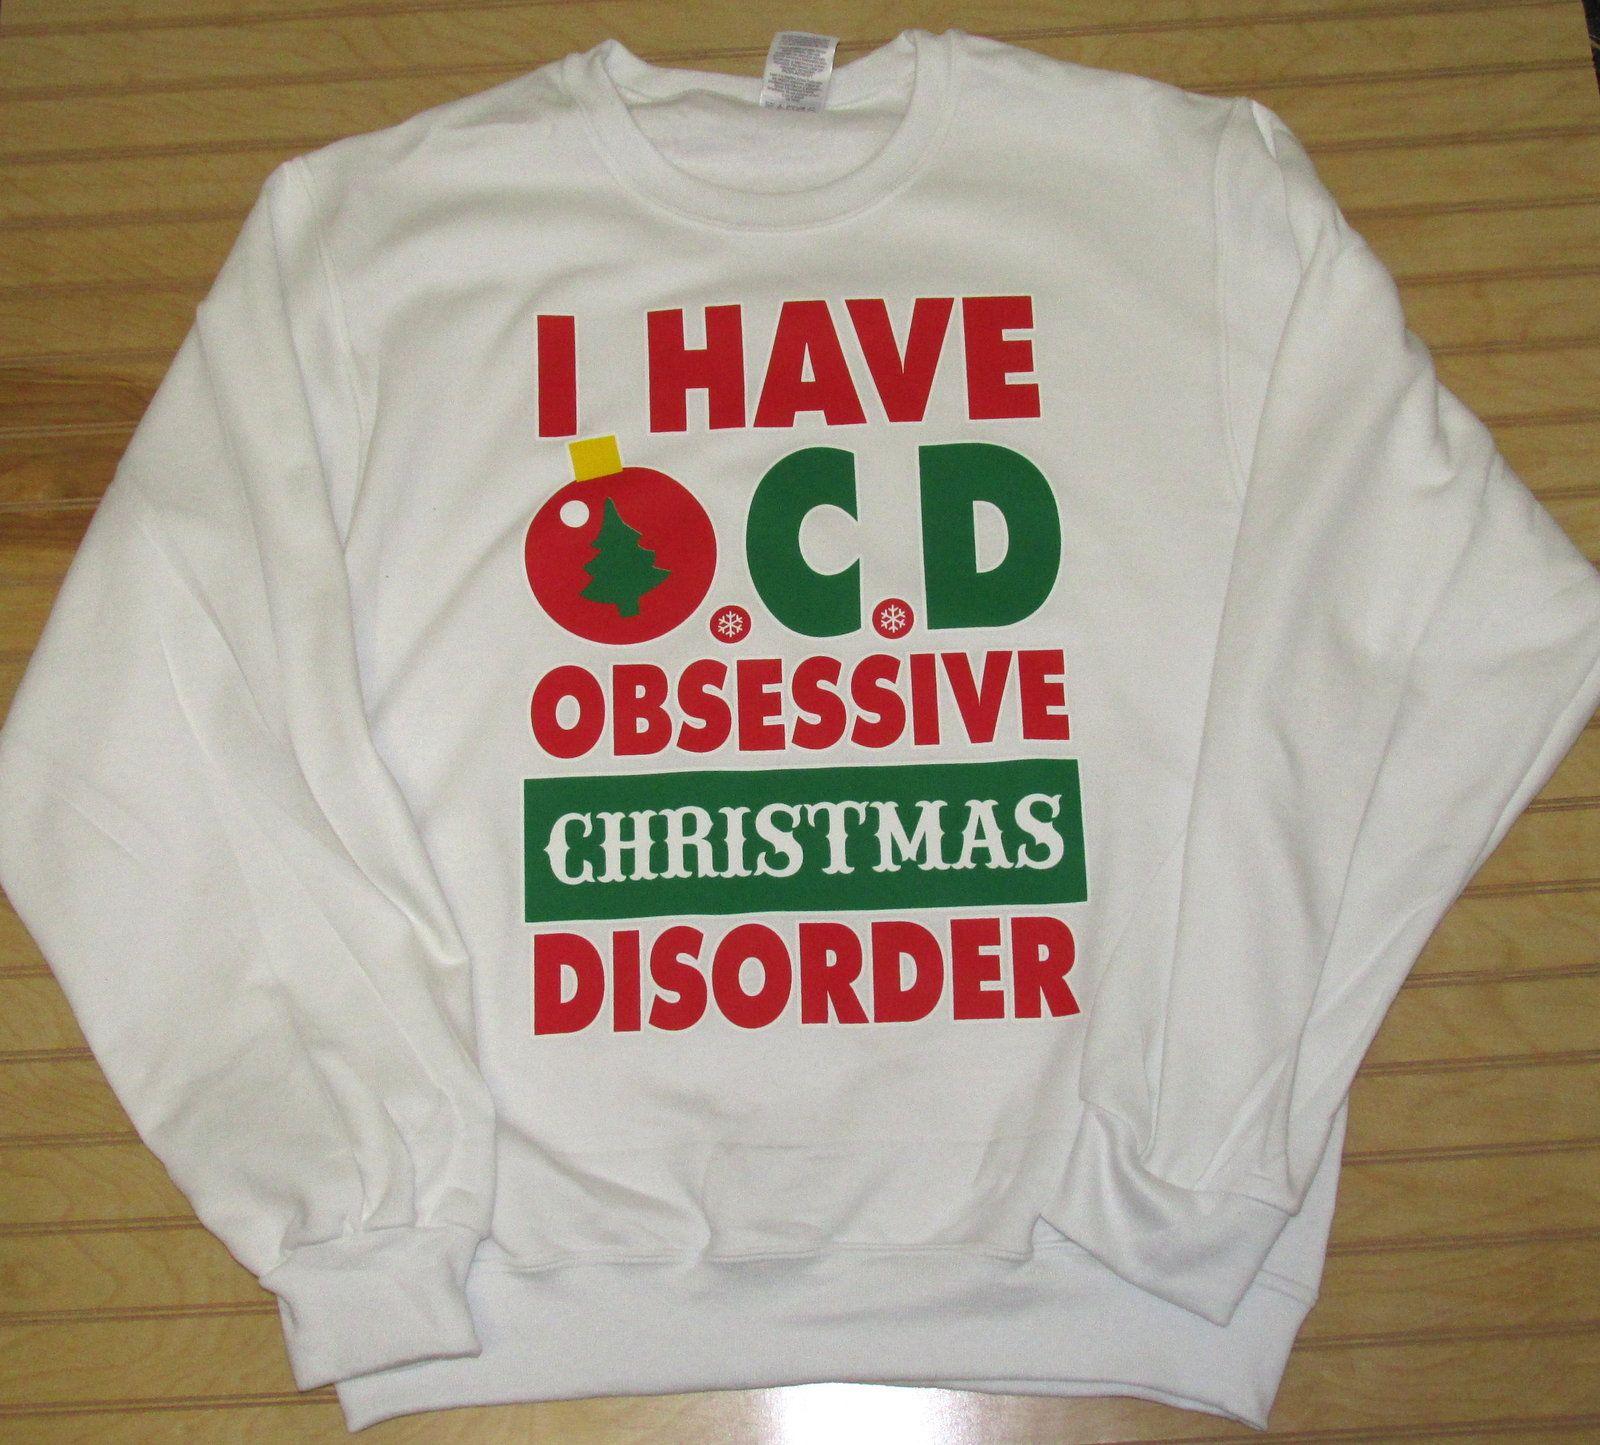 Pullover Sweatshirt I Have OCD, Obsessive Christmas Disorder | Ocd ...